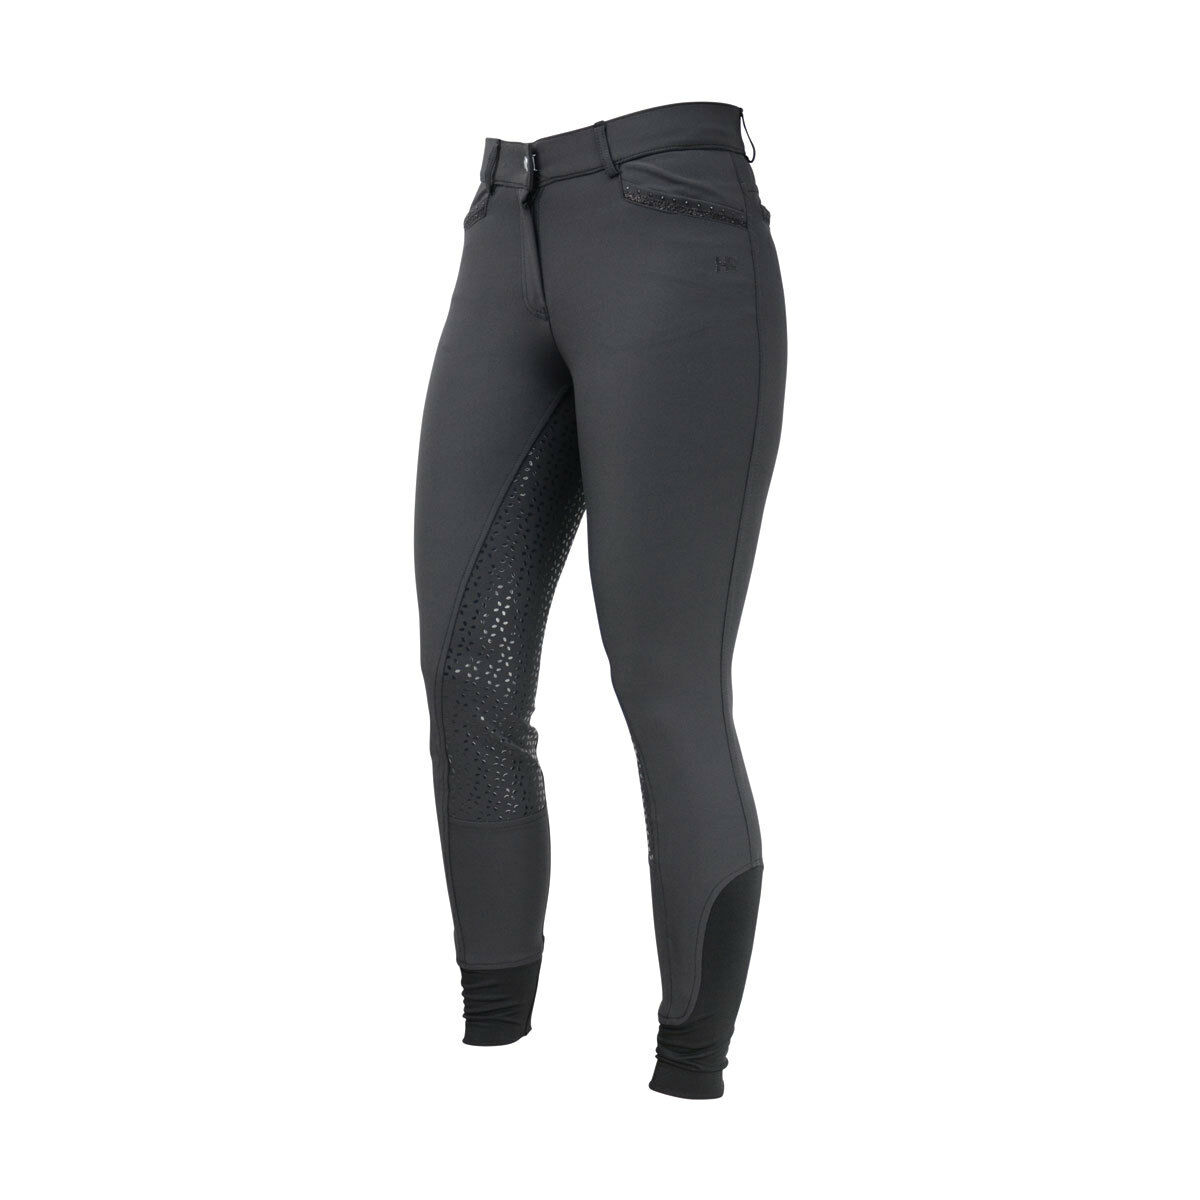 Hyfashion Roka Pantalones  De Montar De Cristal 26  Negro Negro Cristal 13984  barato